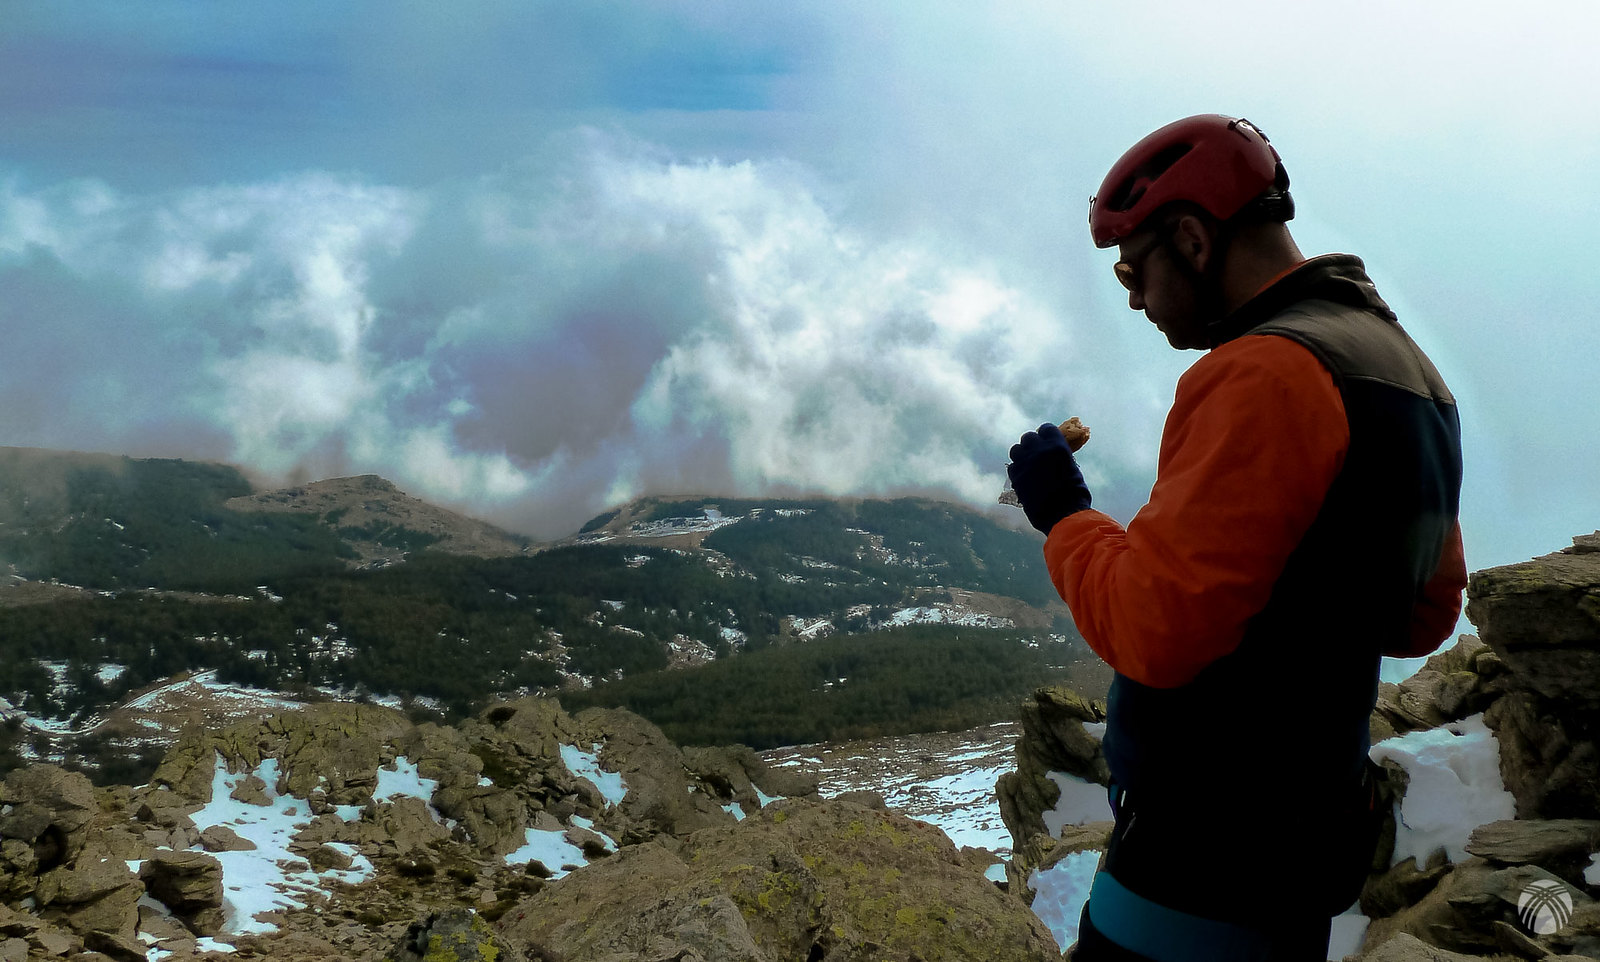 Nubes juguetonas en la zona de la Alpujarra